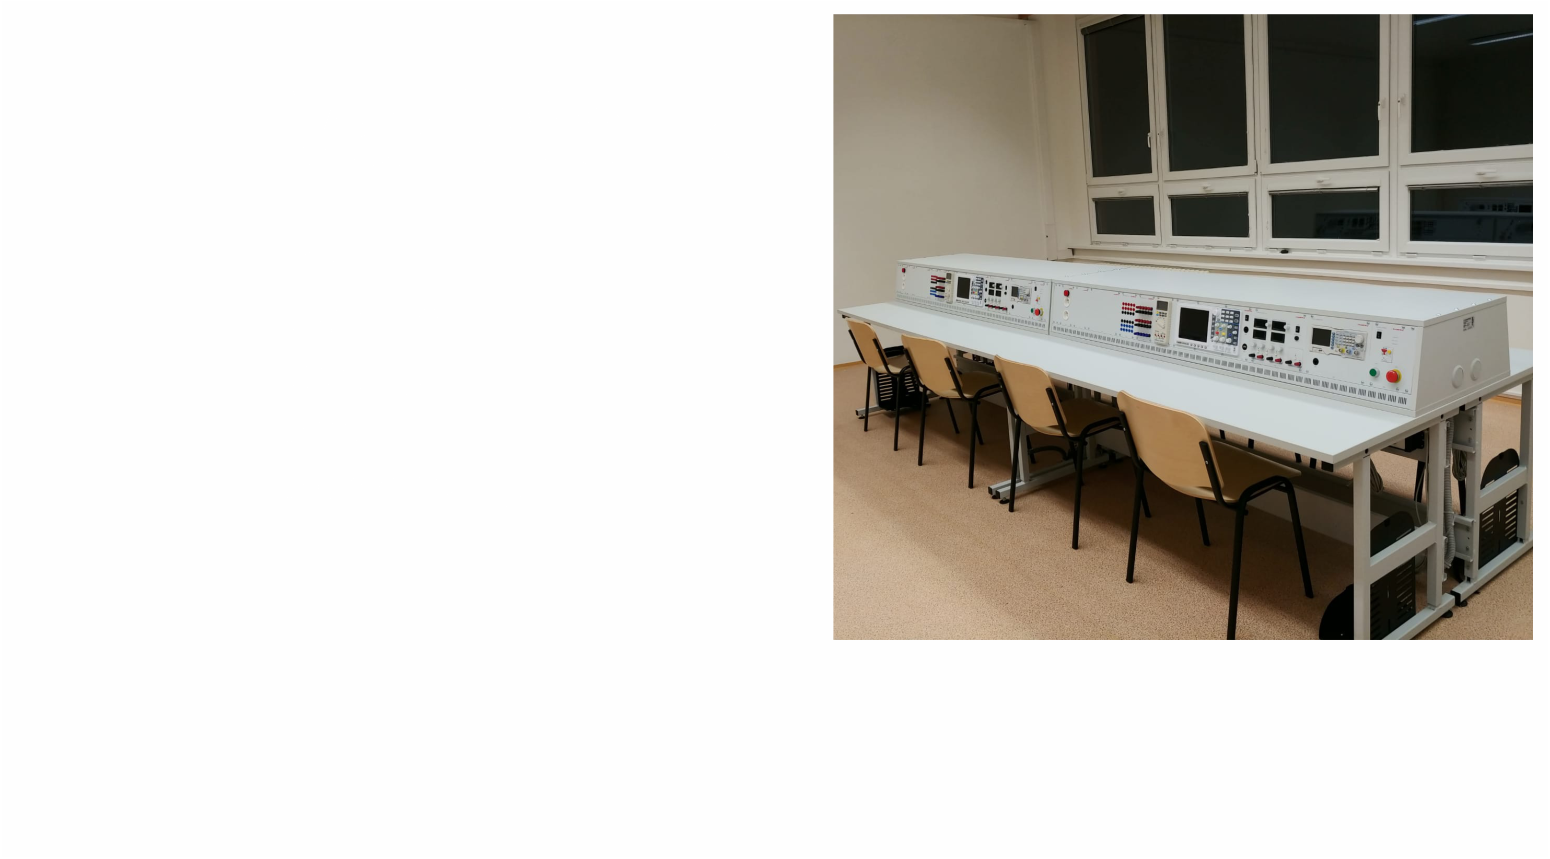 VariWork